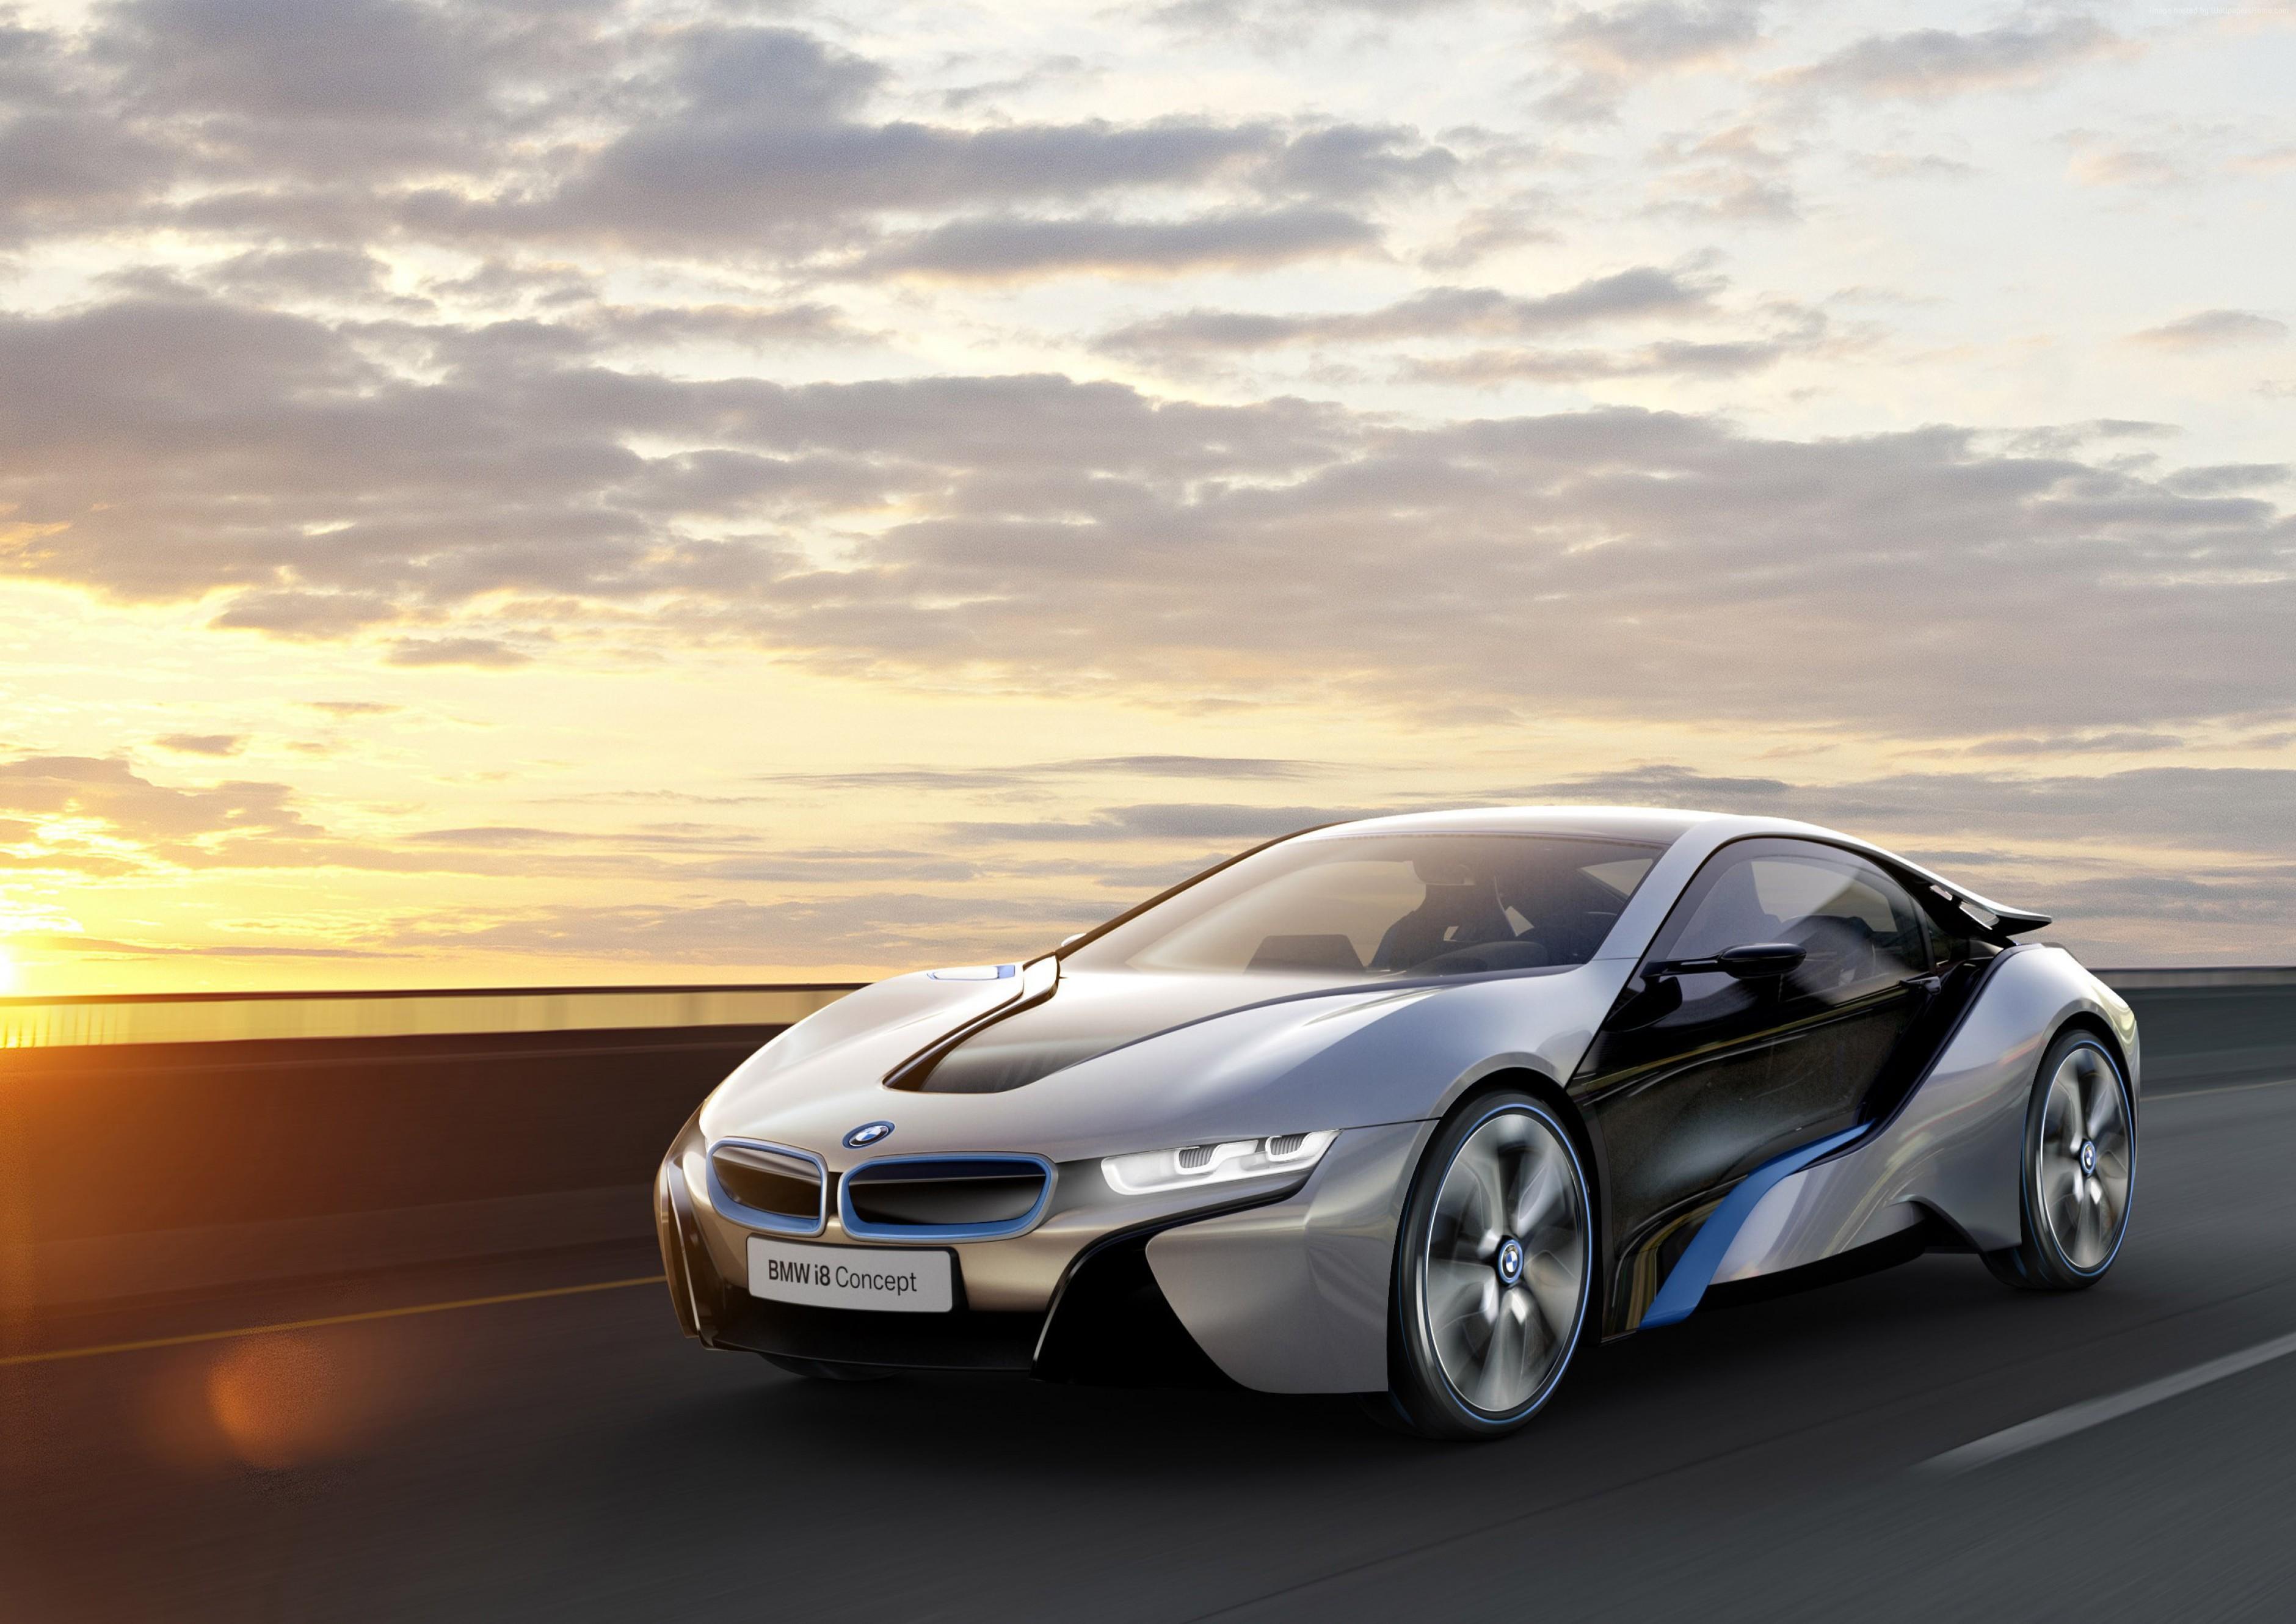 BMW sunset GT 4k carbon HD wallpaper Best Electric 3760x2659